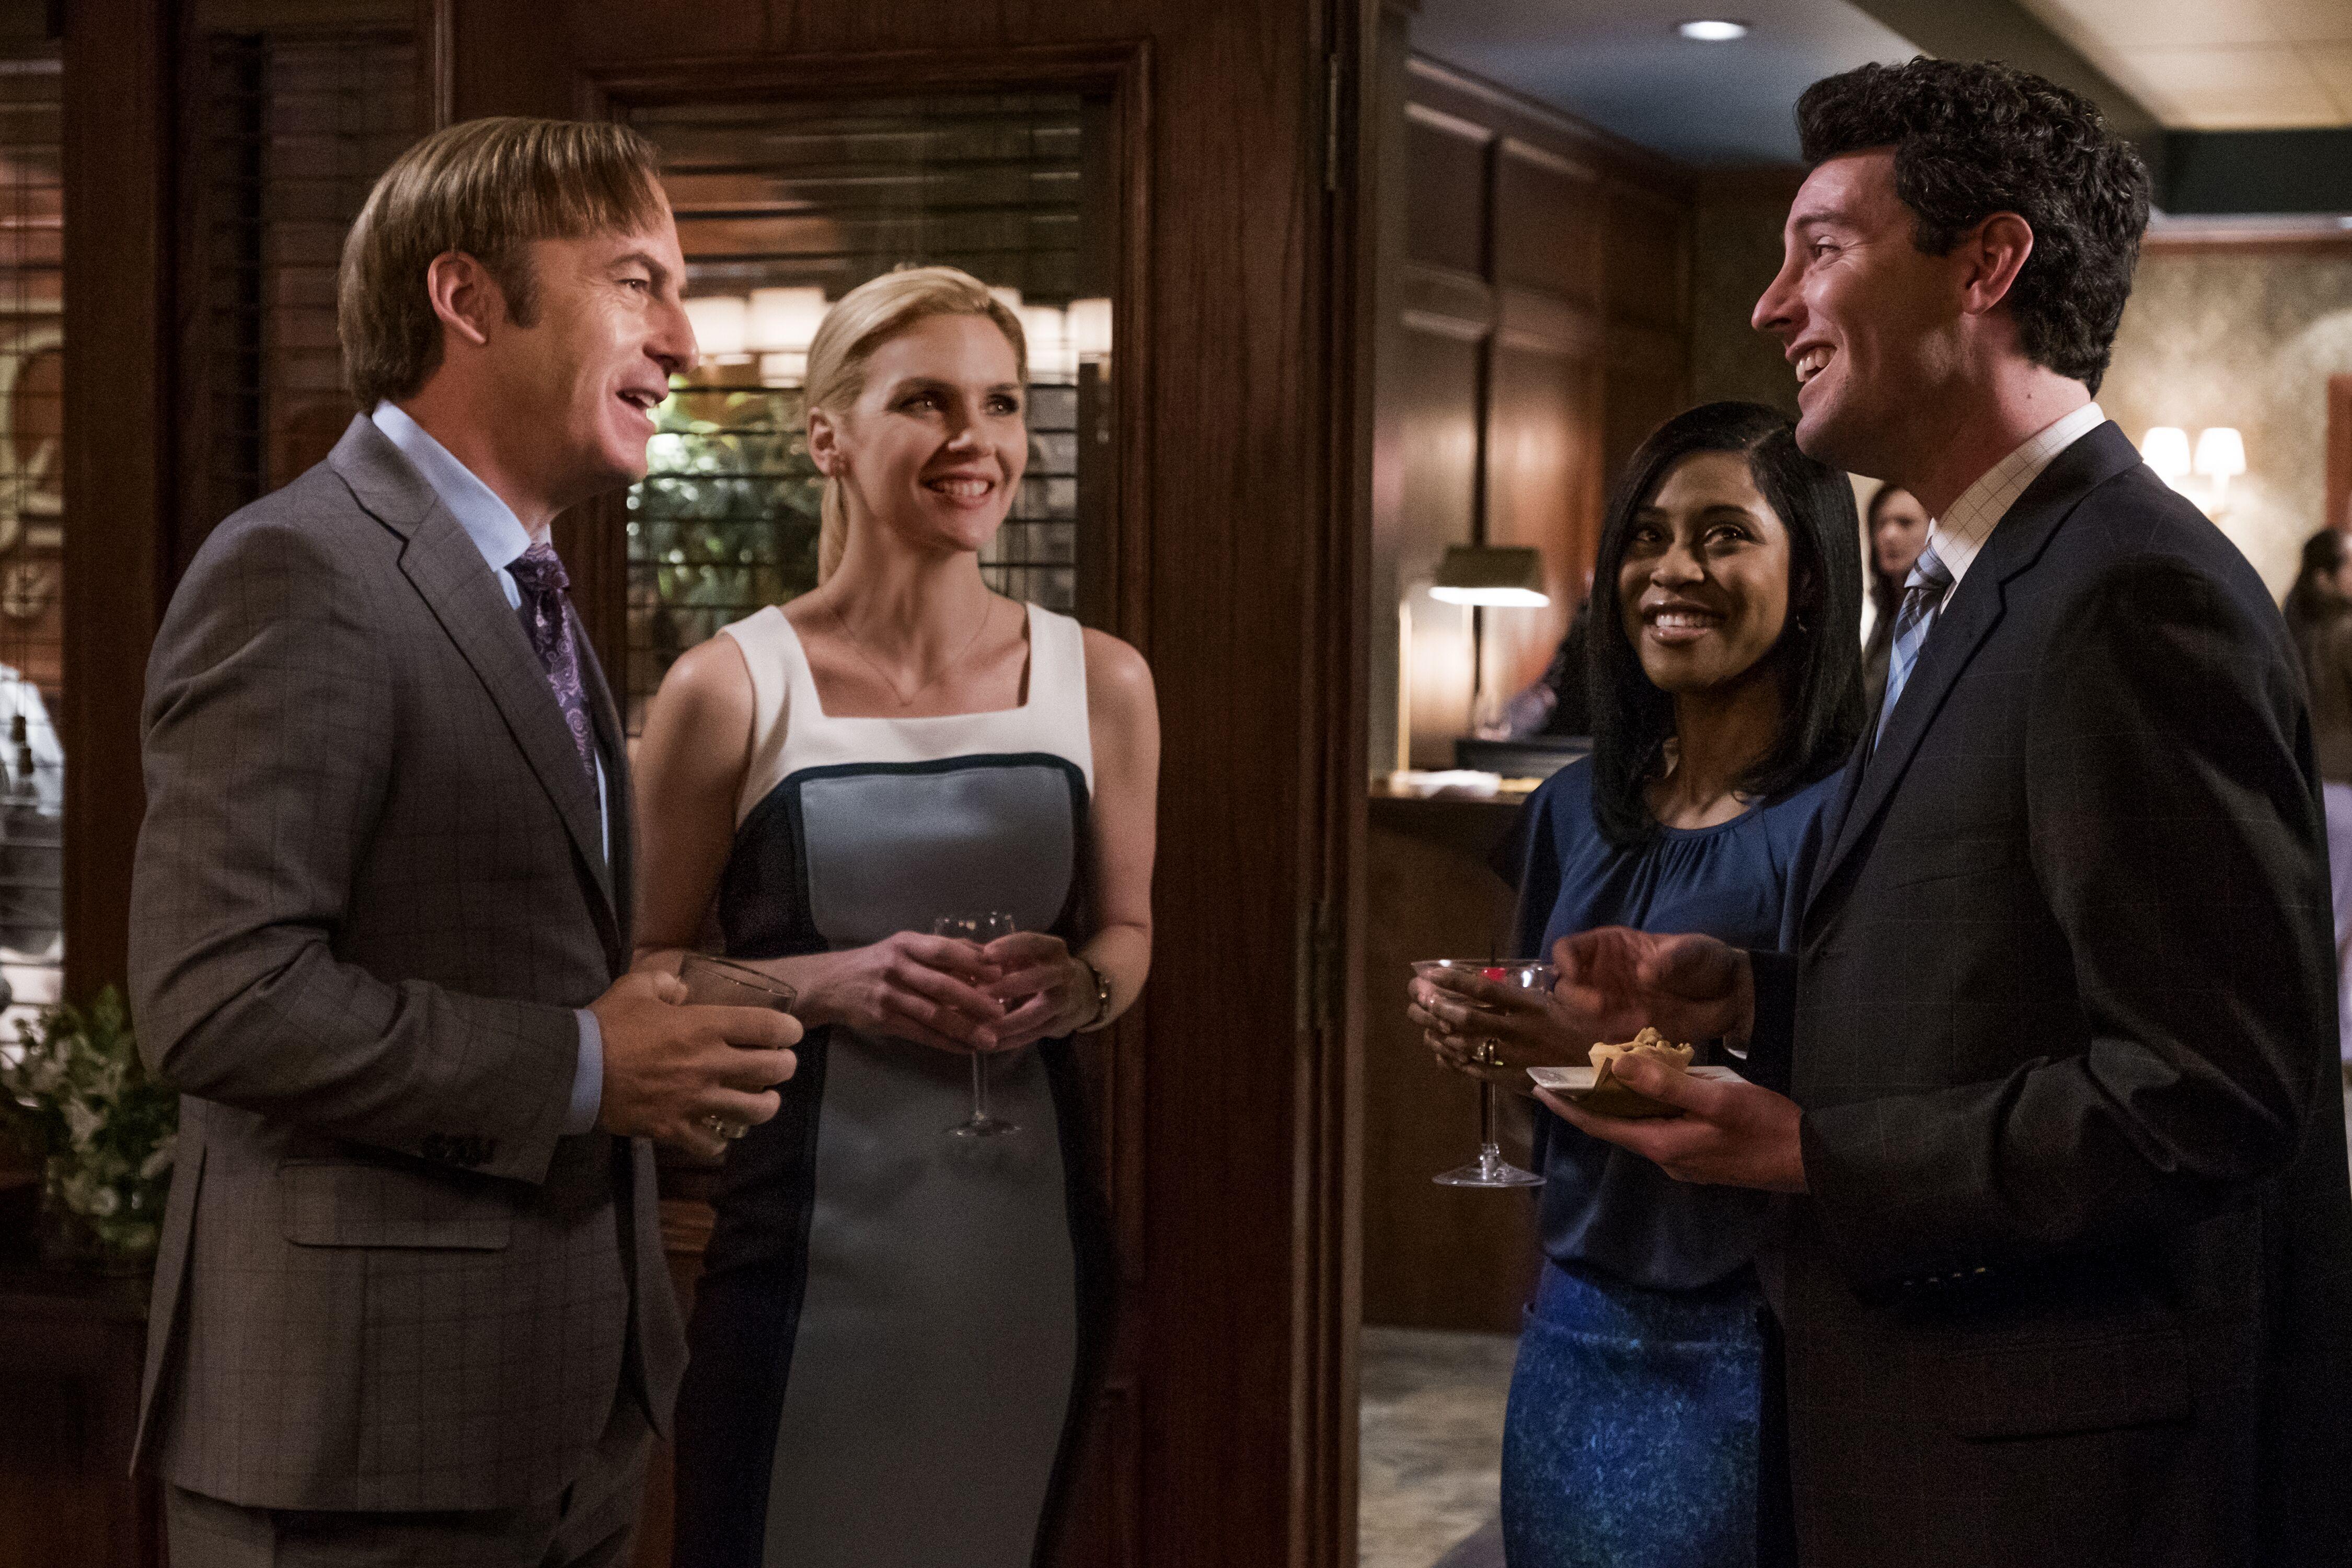 Better Call Saul season 4, episode 7 recap: Here's Saul